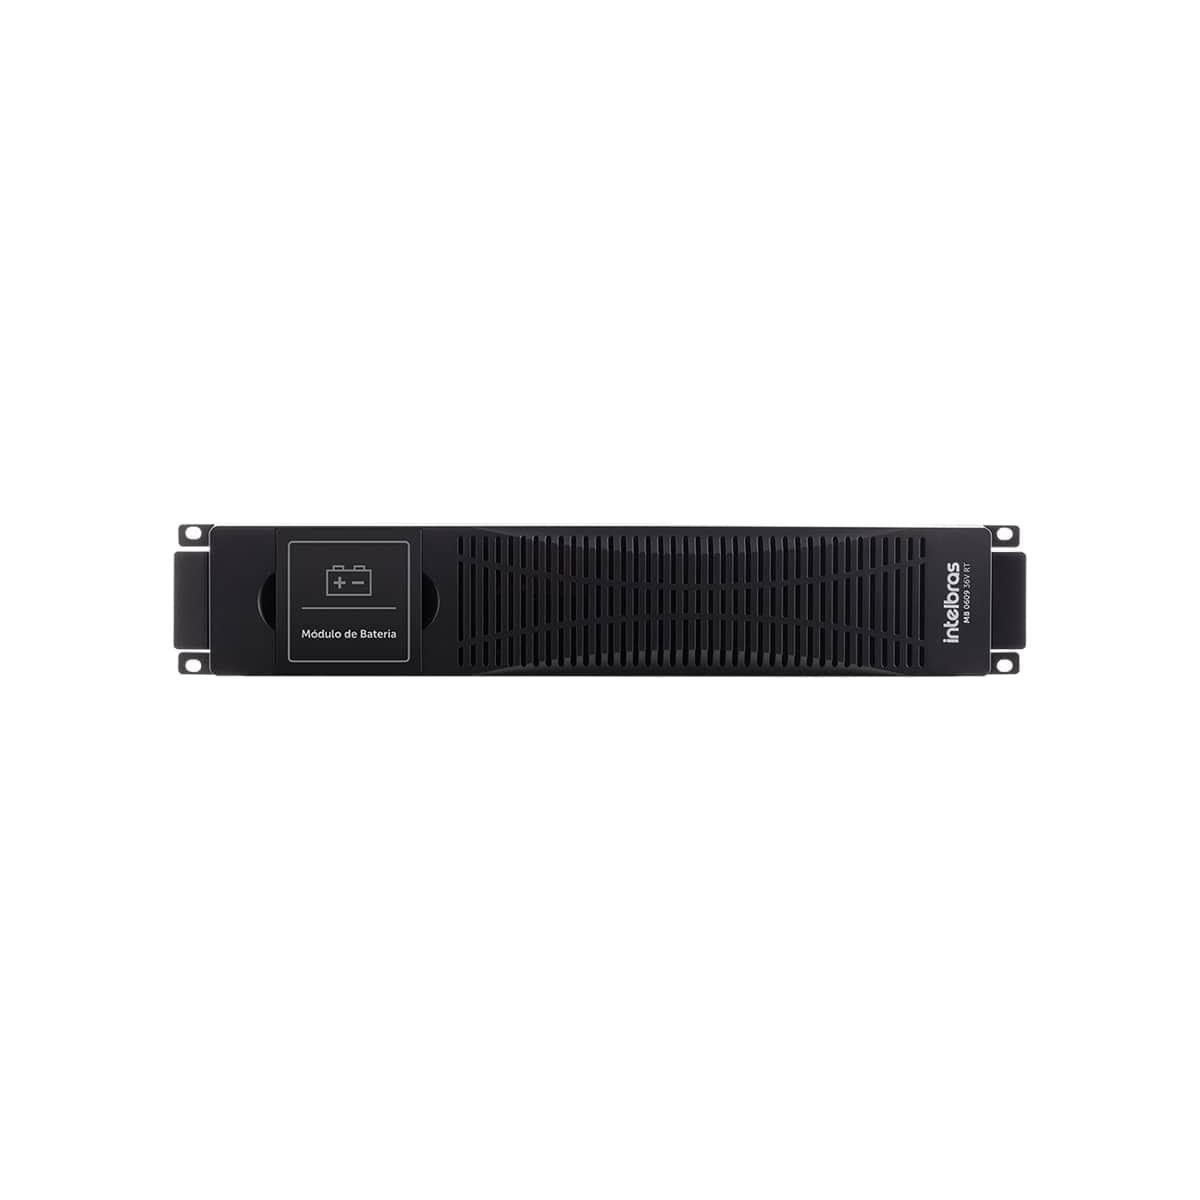 Módulo de Baterias Intelbras MB 0609 36V-RT